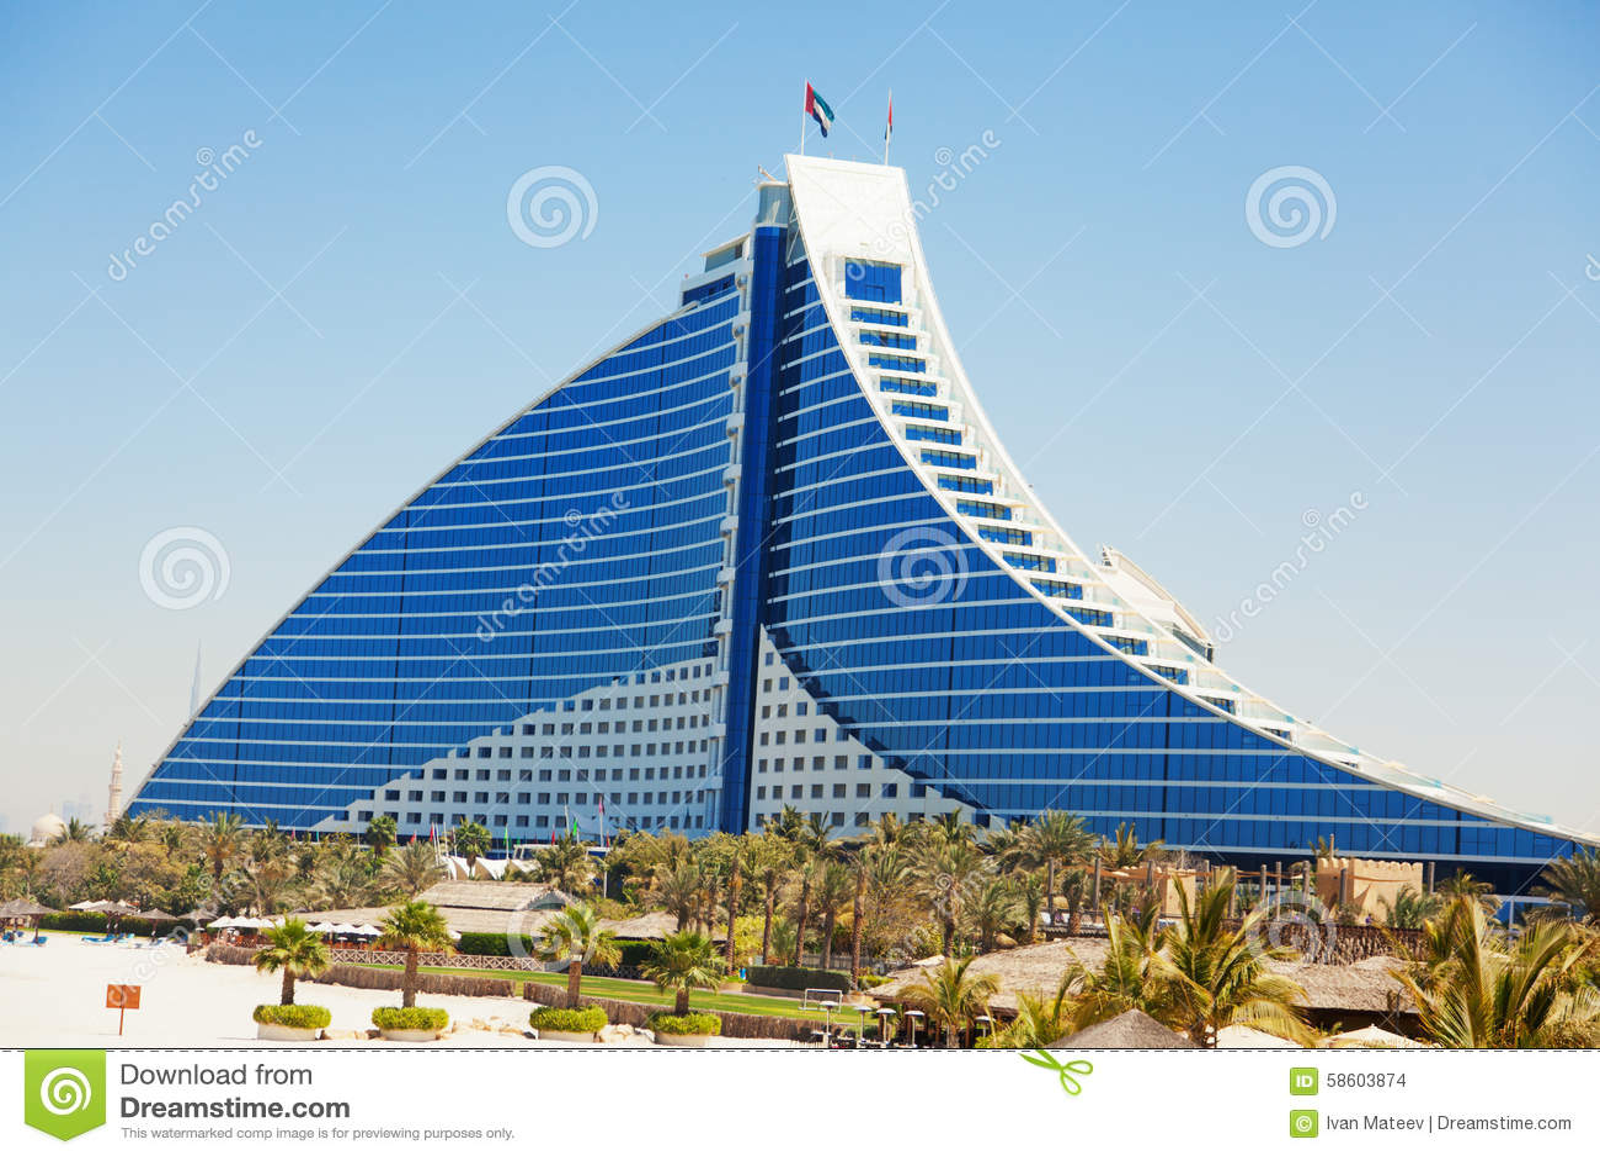 Jumeirah beach hotel dubai editorial stock image image for Top beach hotels dubai